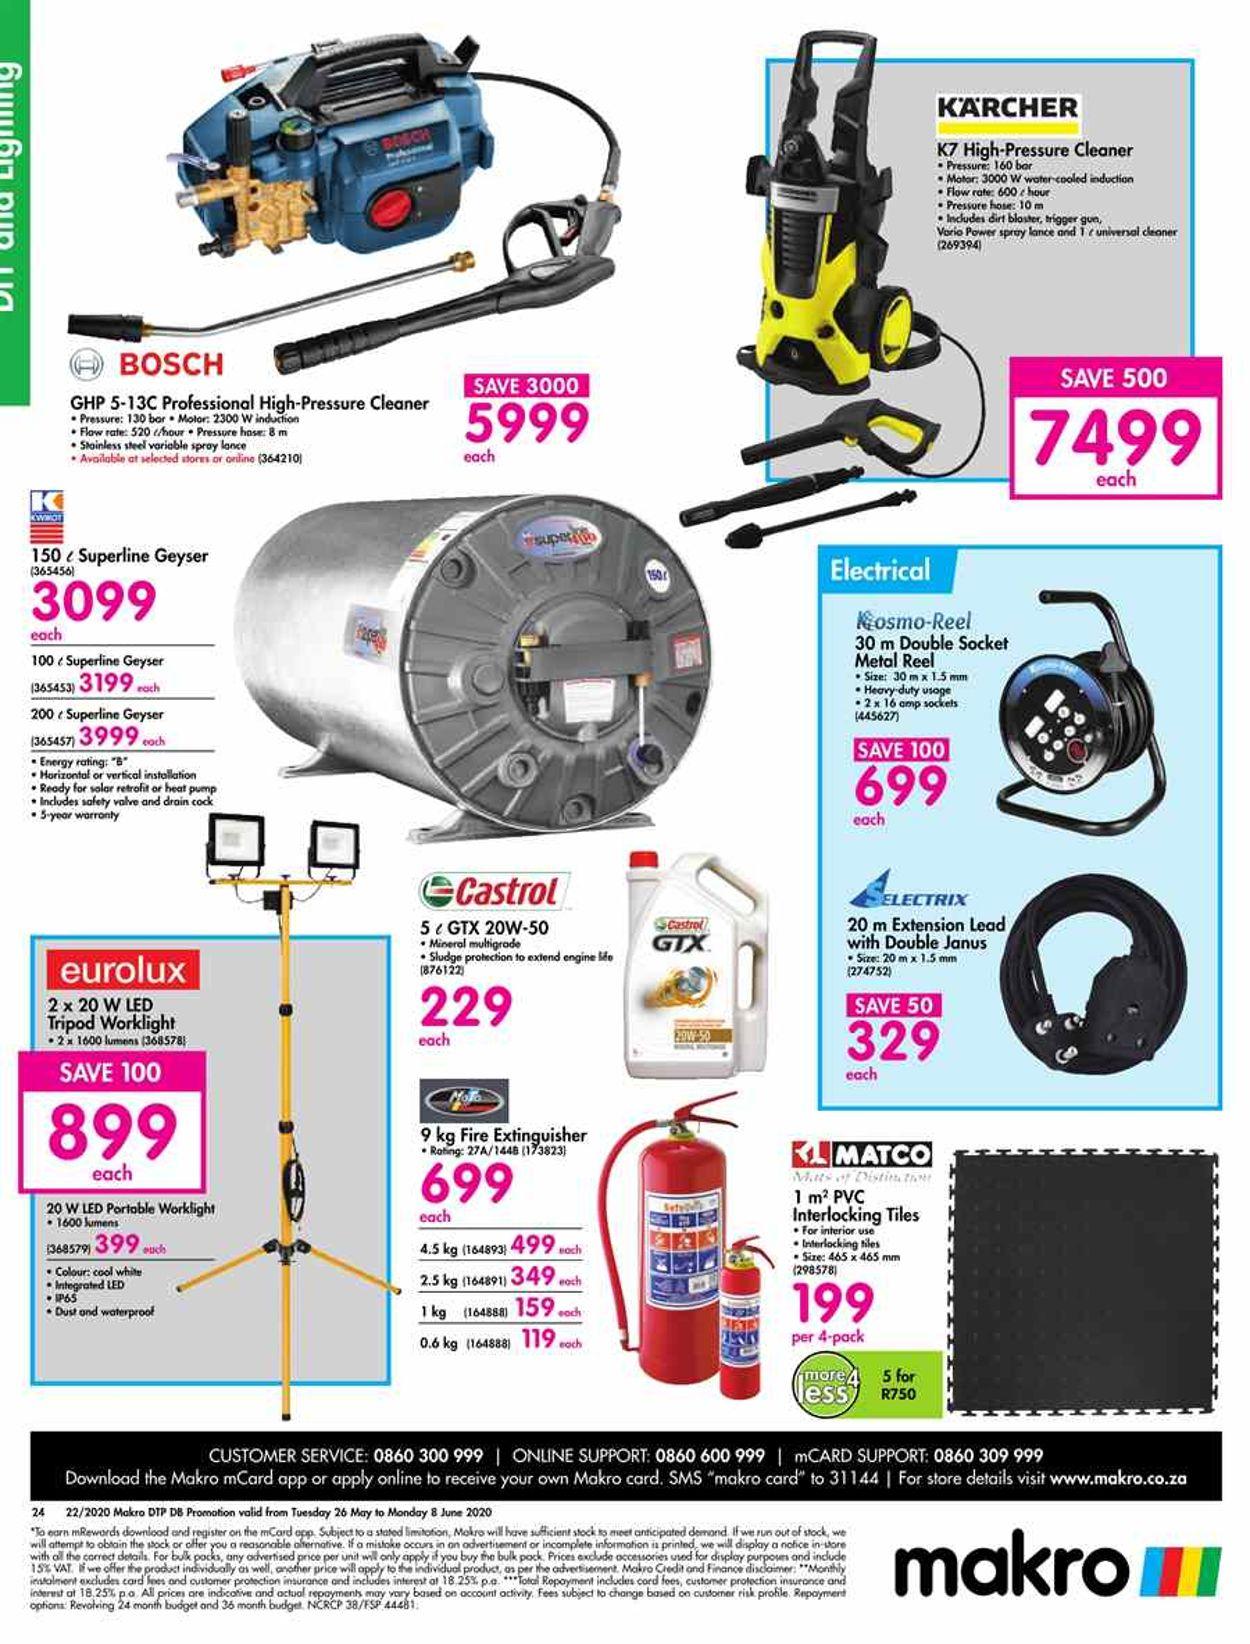 Makro Catalogue - 2020/05/26-2020/06/08 (Page 24)